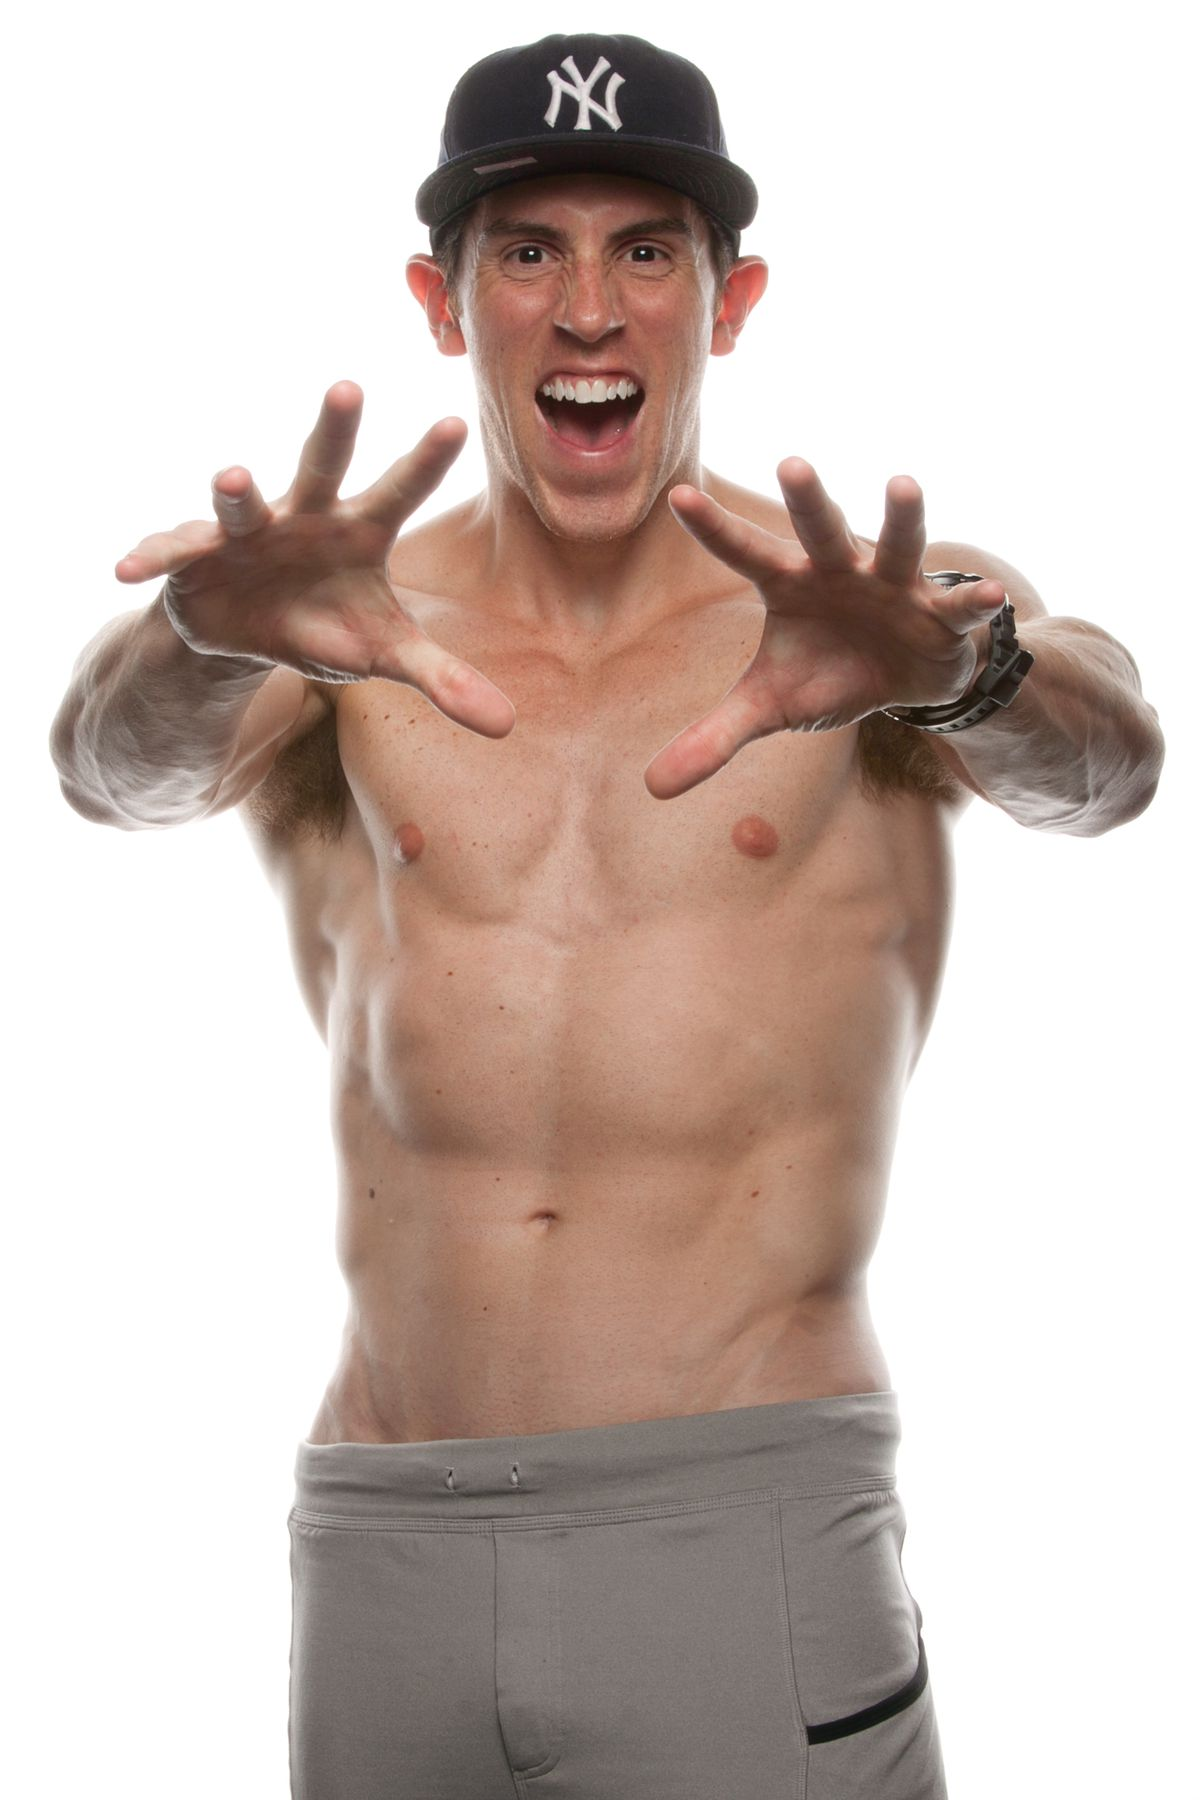 NYC's Hottest Trainer 2015 Contestant #16: Matt Nolan, Barry's Bootcamp